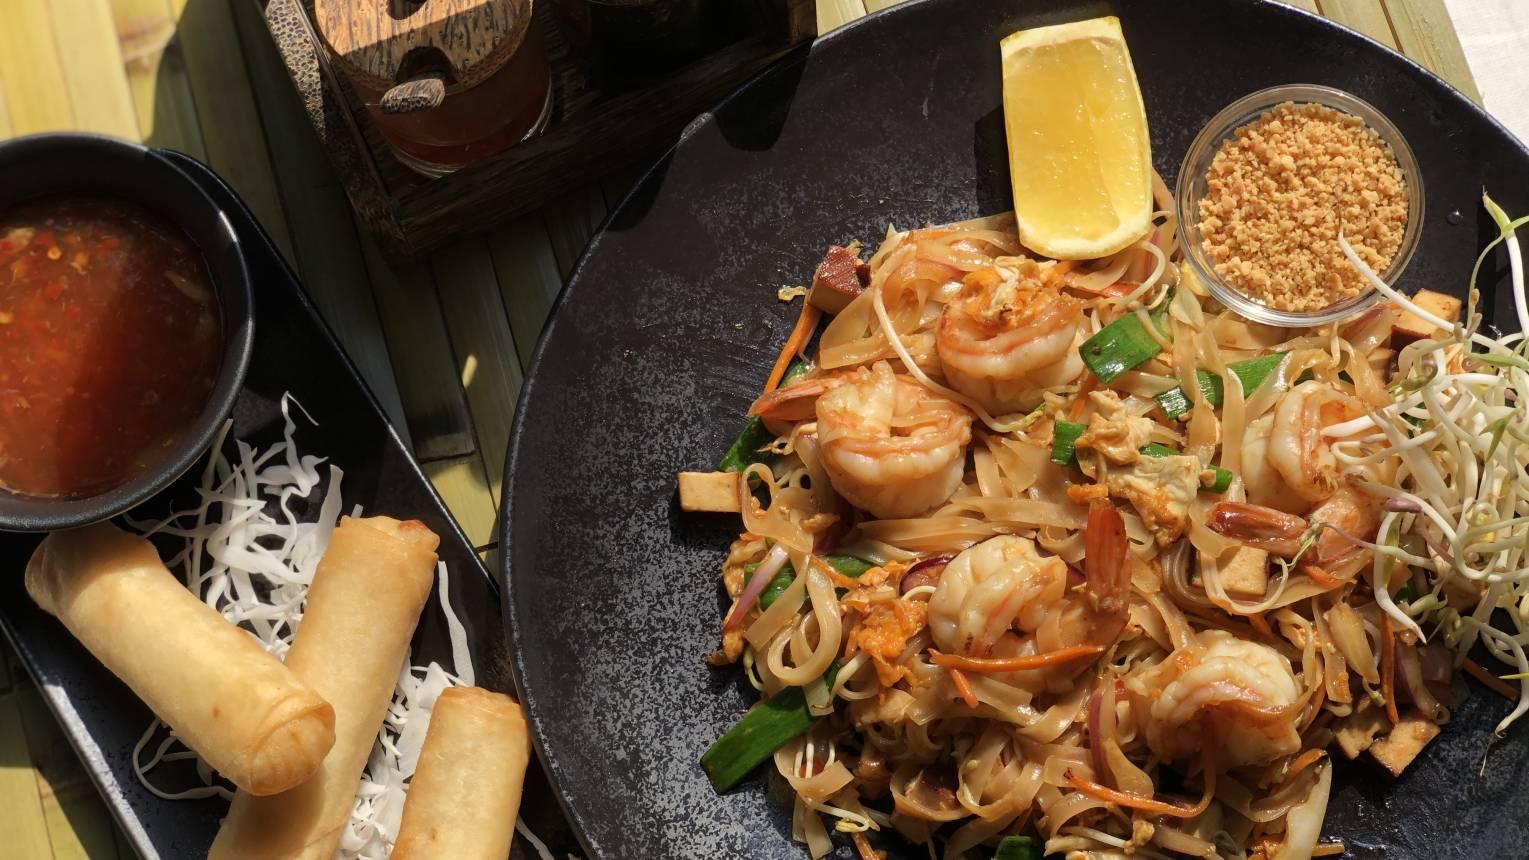 Tom Yum  Étteremben Thai menükülönlegesség